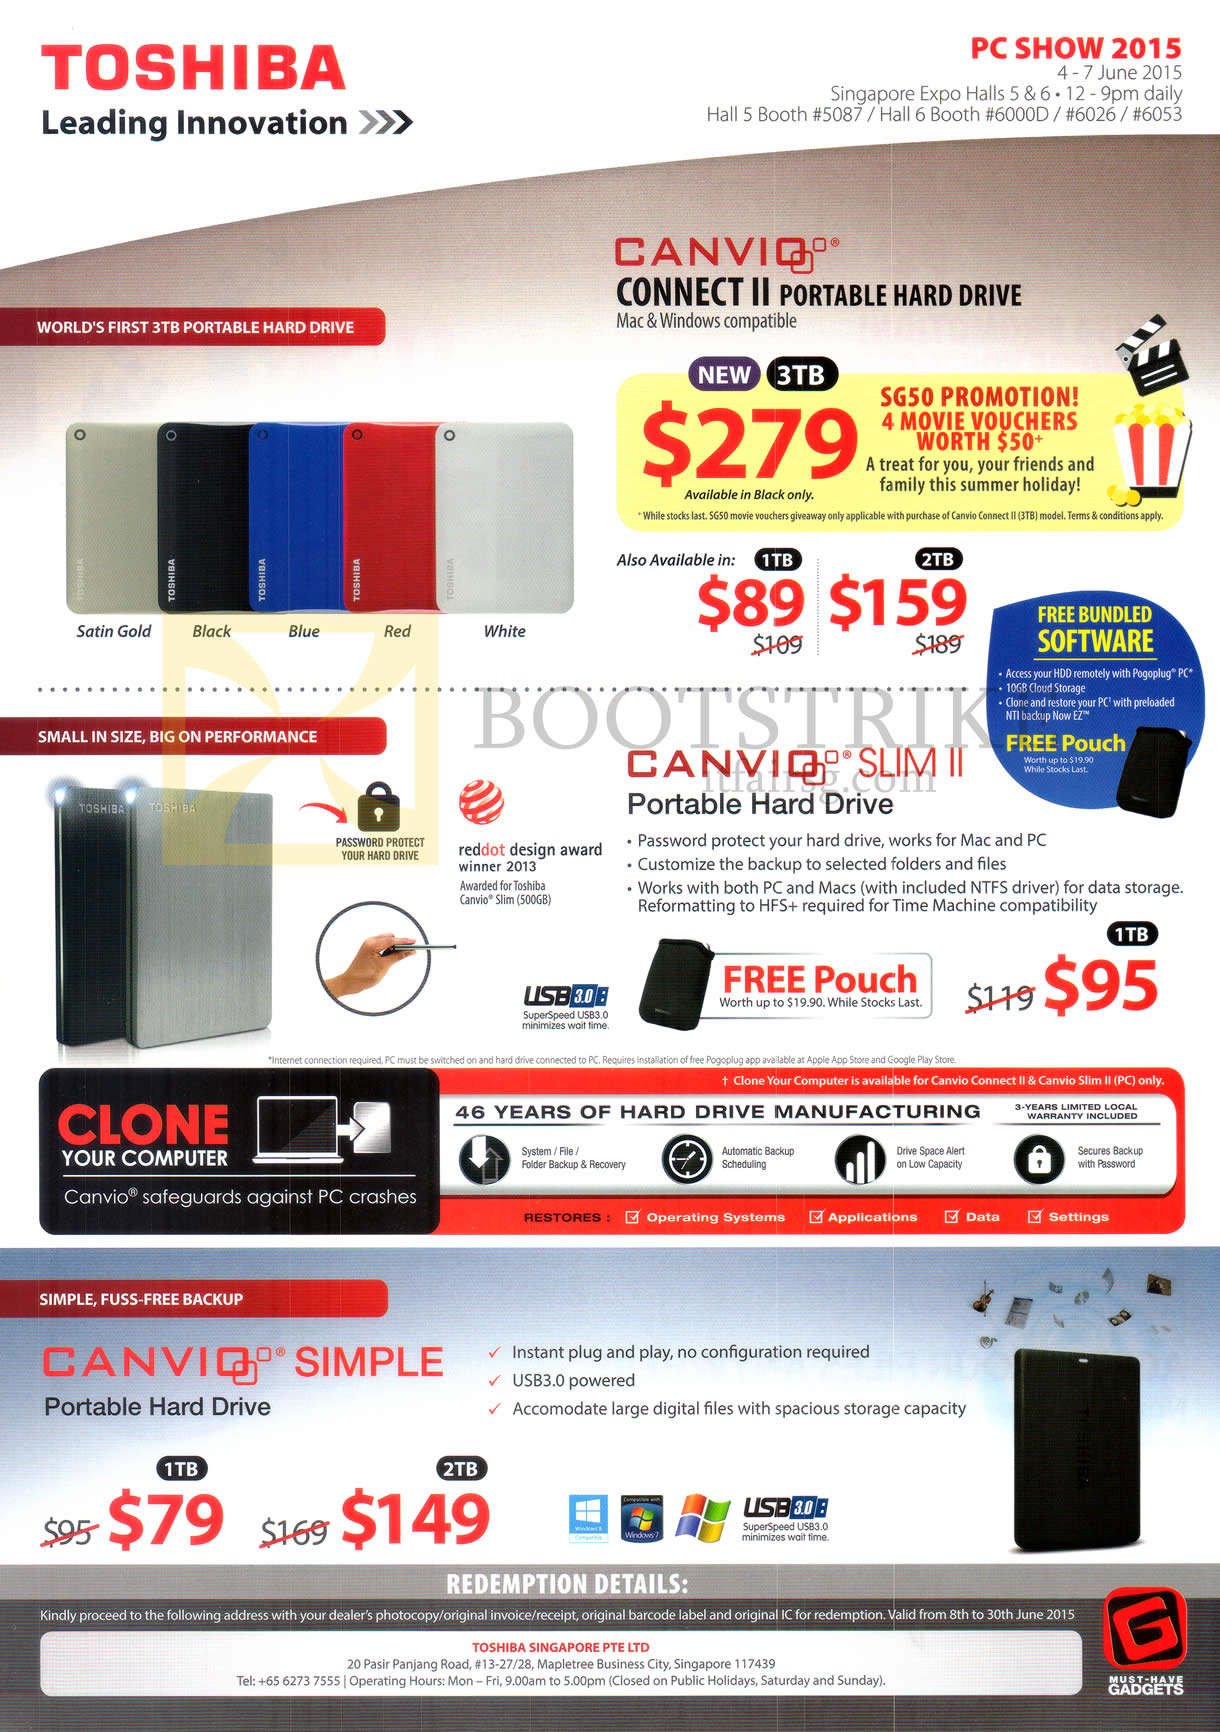 PC SHOW 2015 price list image brochure of Toshiba Hard Disk Drives Connect II 1TB 2TB 3TB, Canvio Slim II, Simple